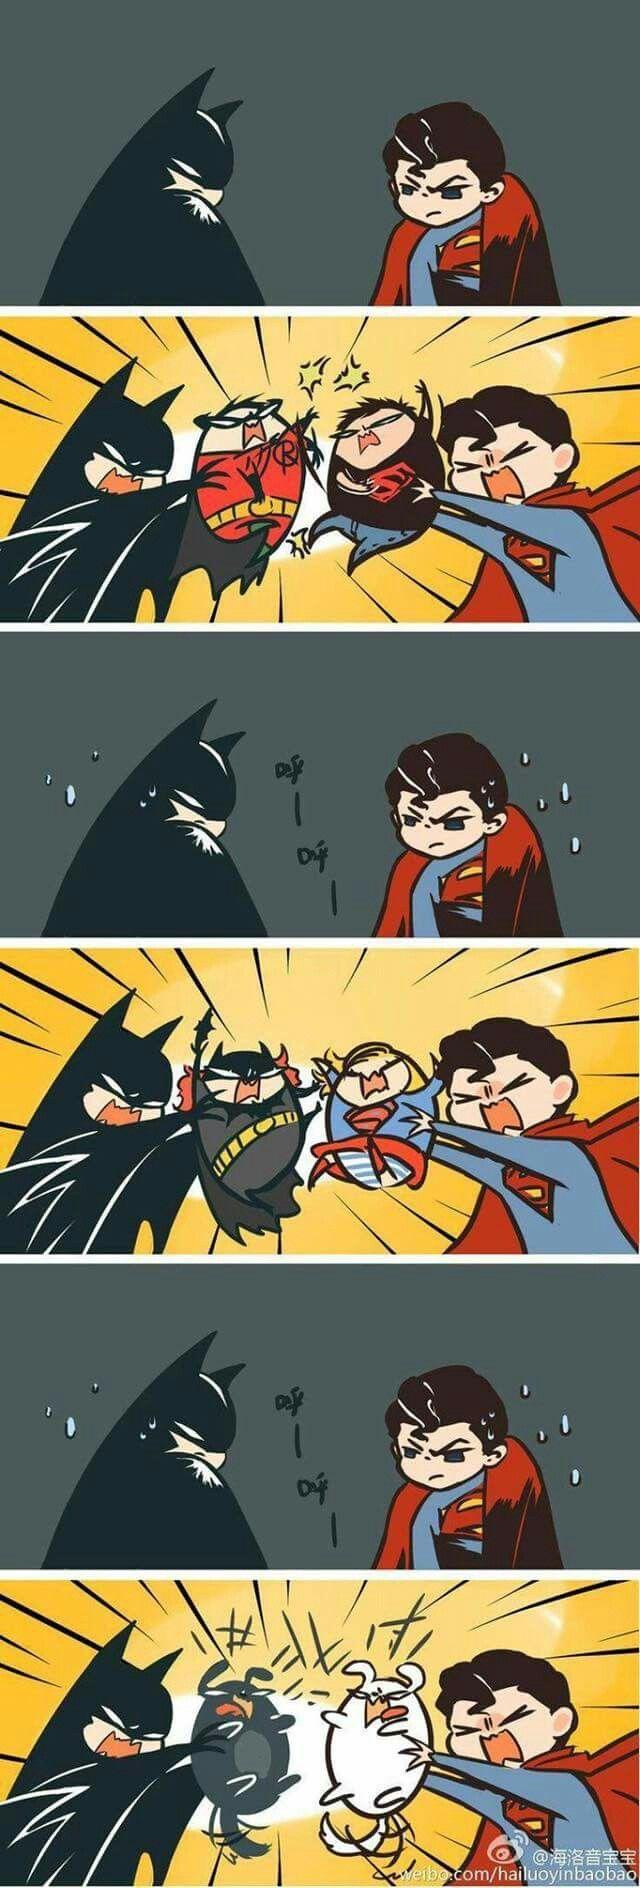 Batman vs. Superman (Featuring: Robin, Superboy, Batgirl, Supergirl, Ace the Bathound, and Krypto the Superdog)